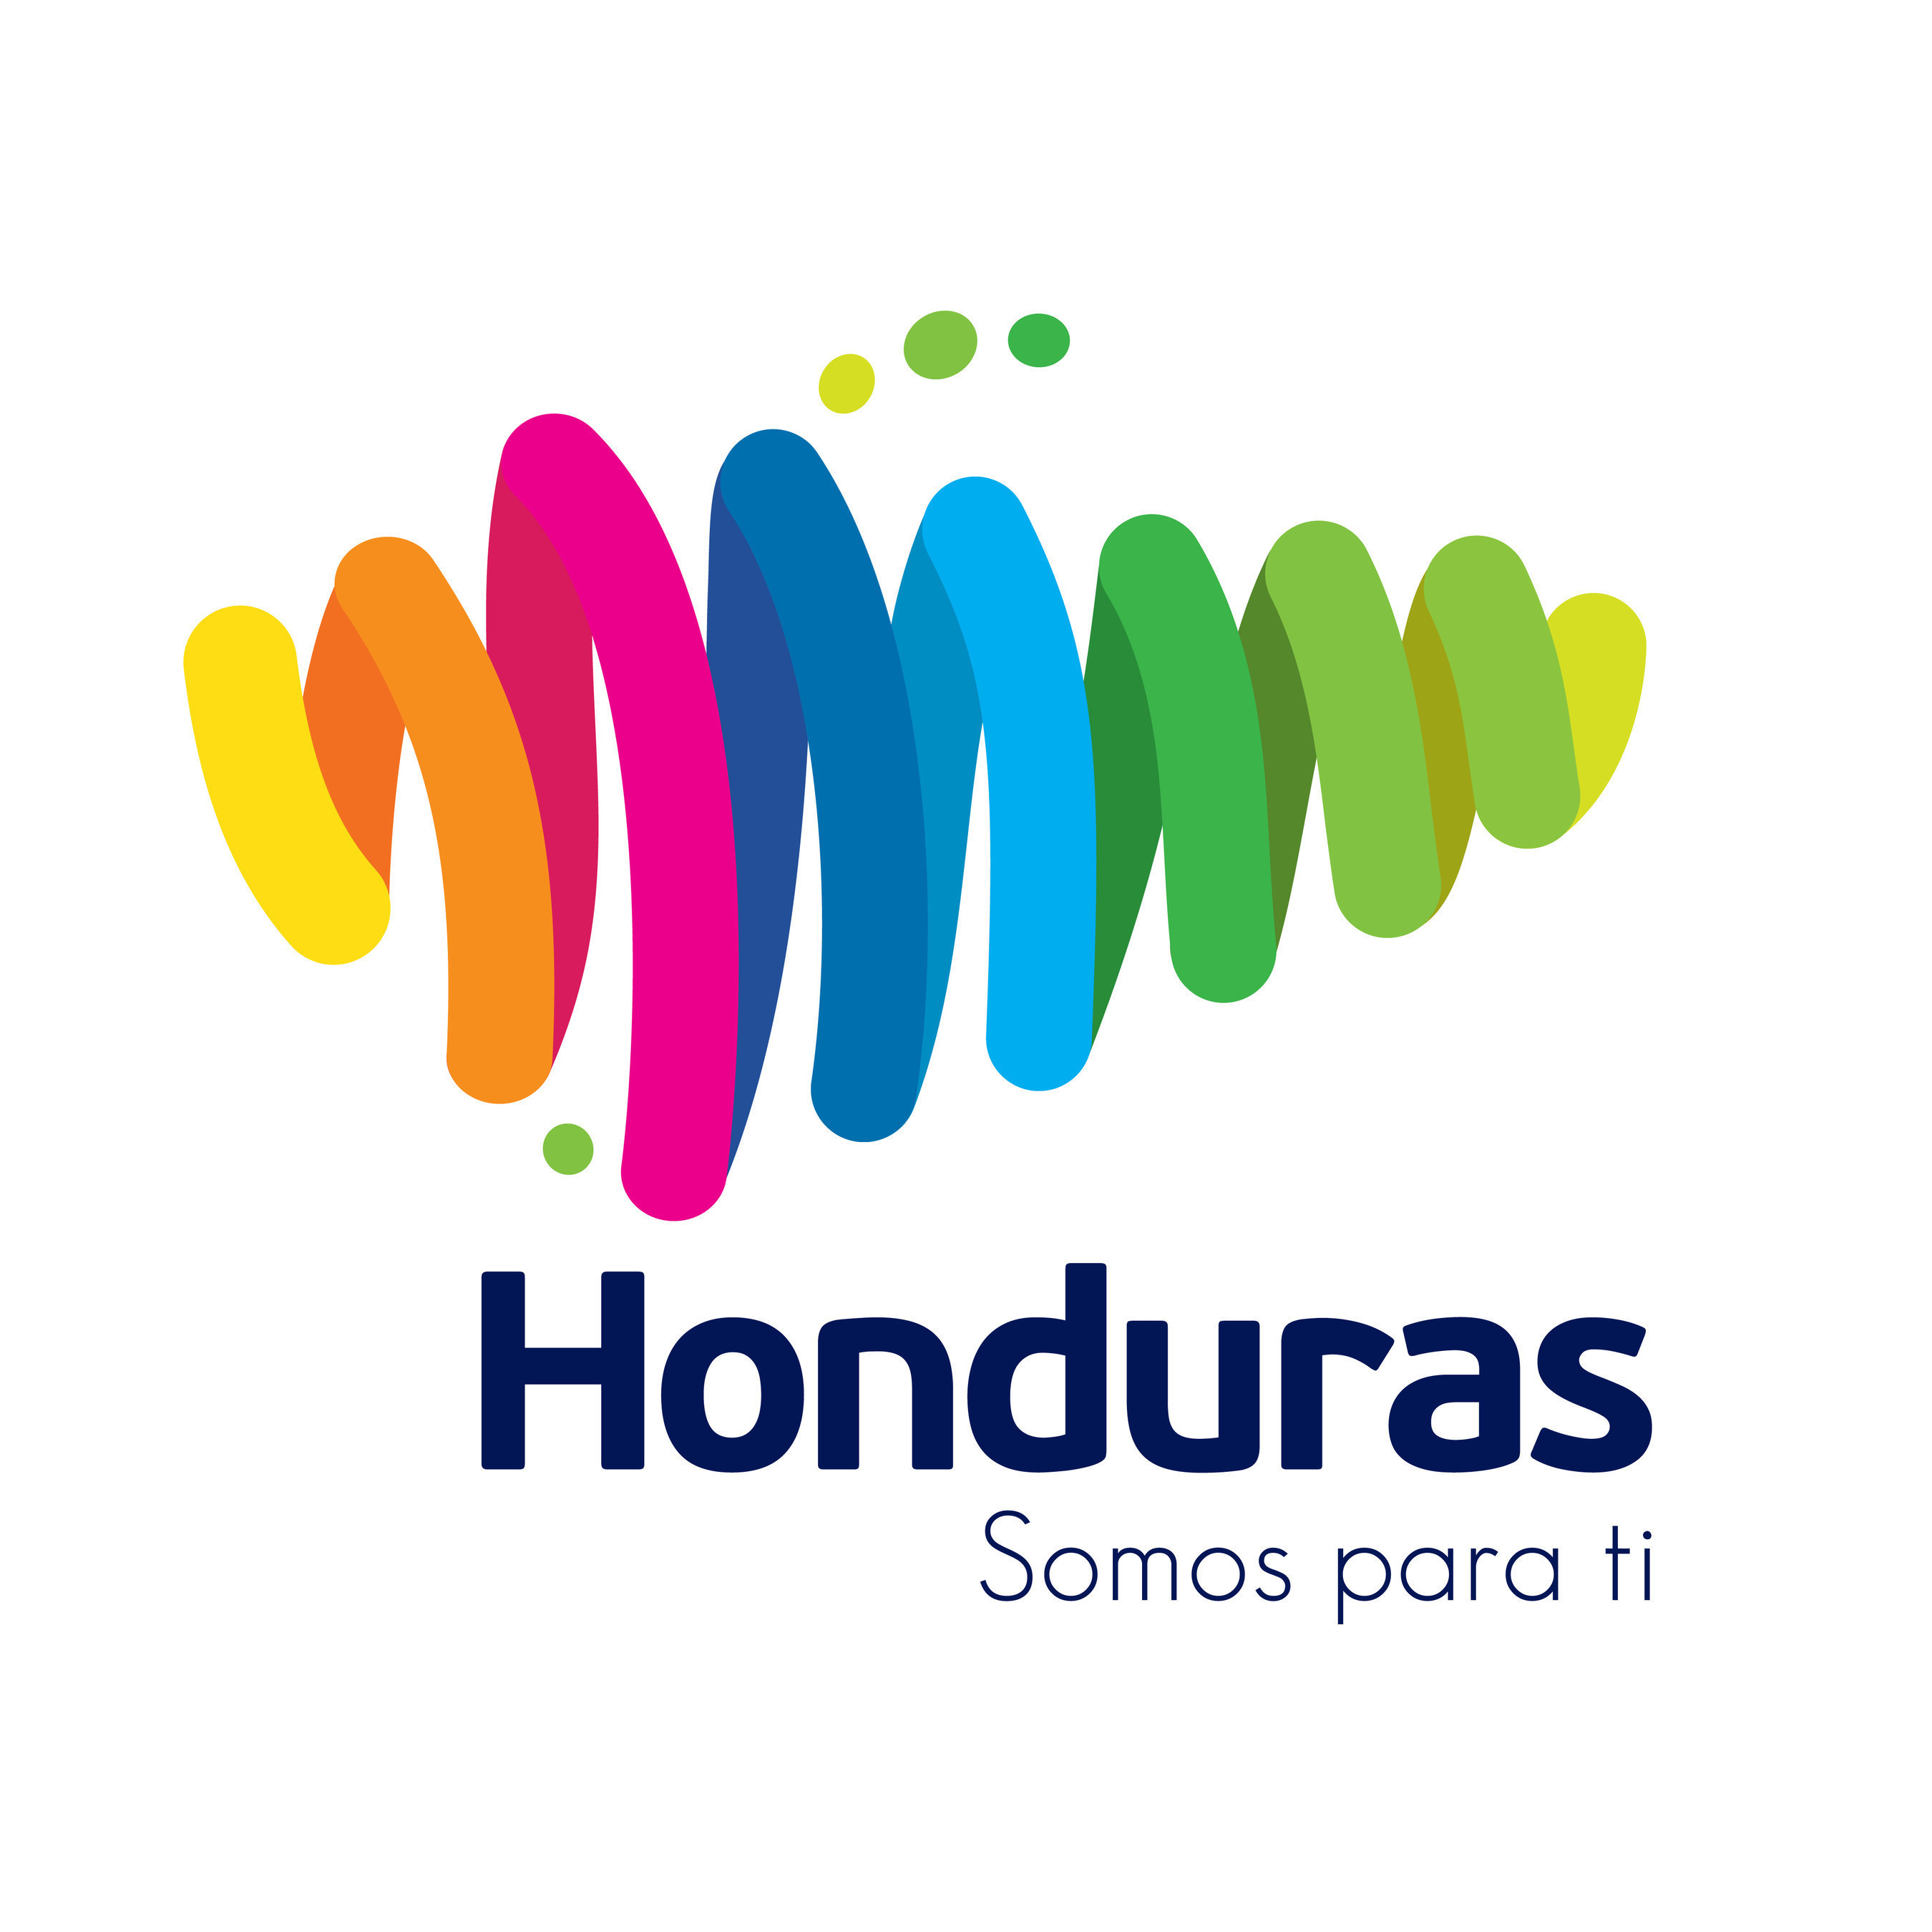 Honduras official country brand logo.